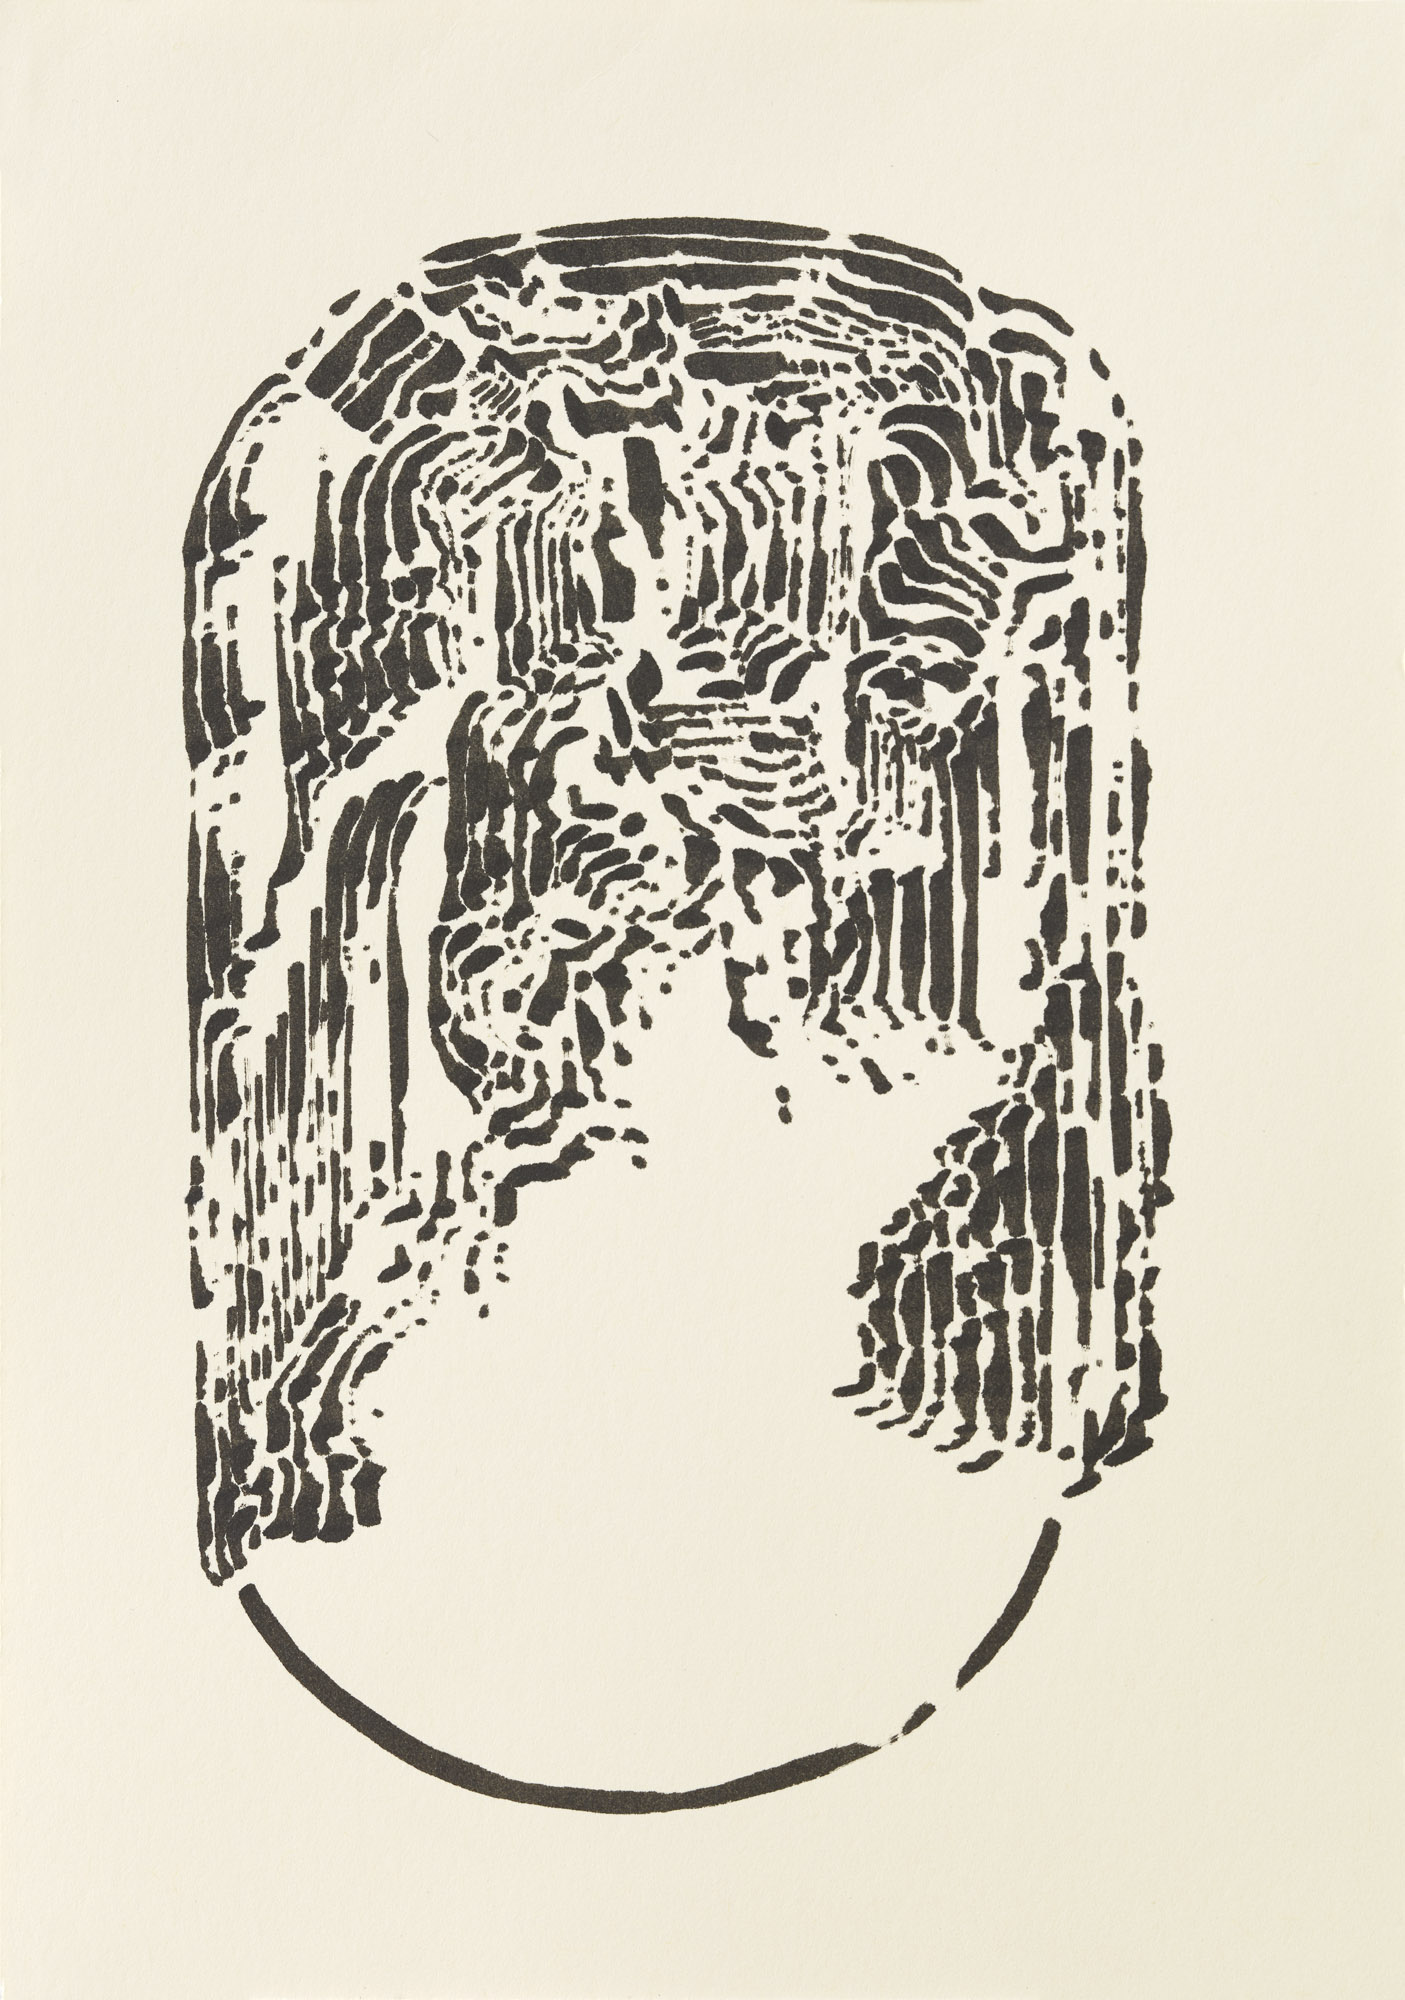 BK P7539 | untitled | ink on paper | 21x15cm | 2015